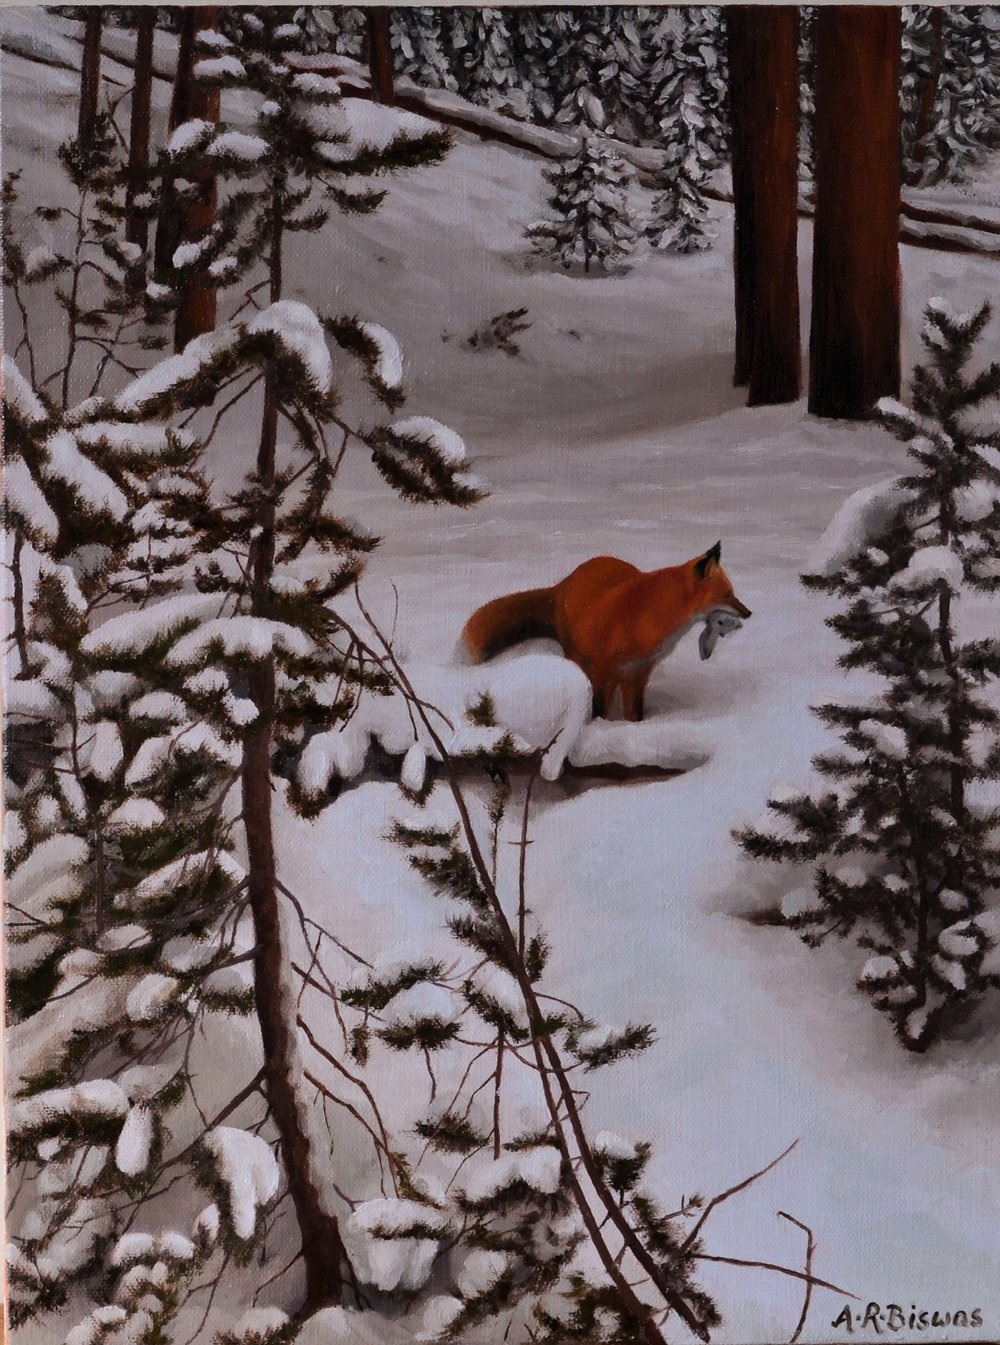 Trouble in winter wonderland